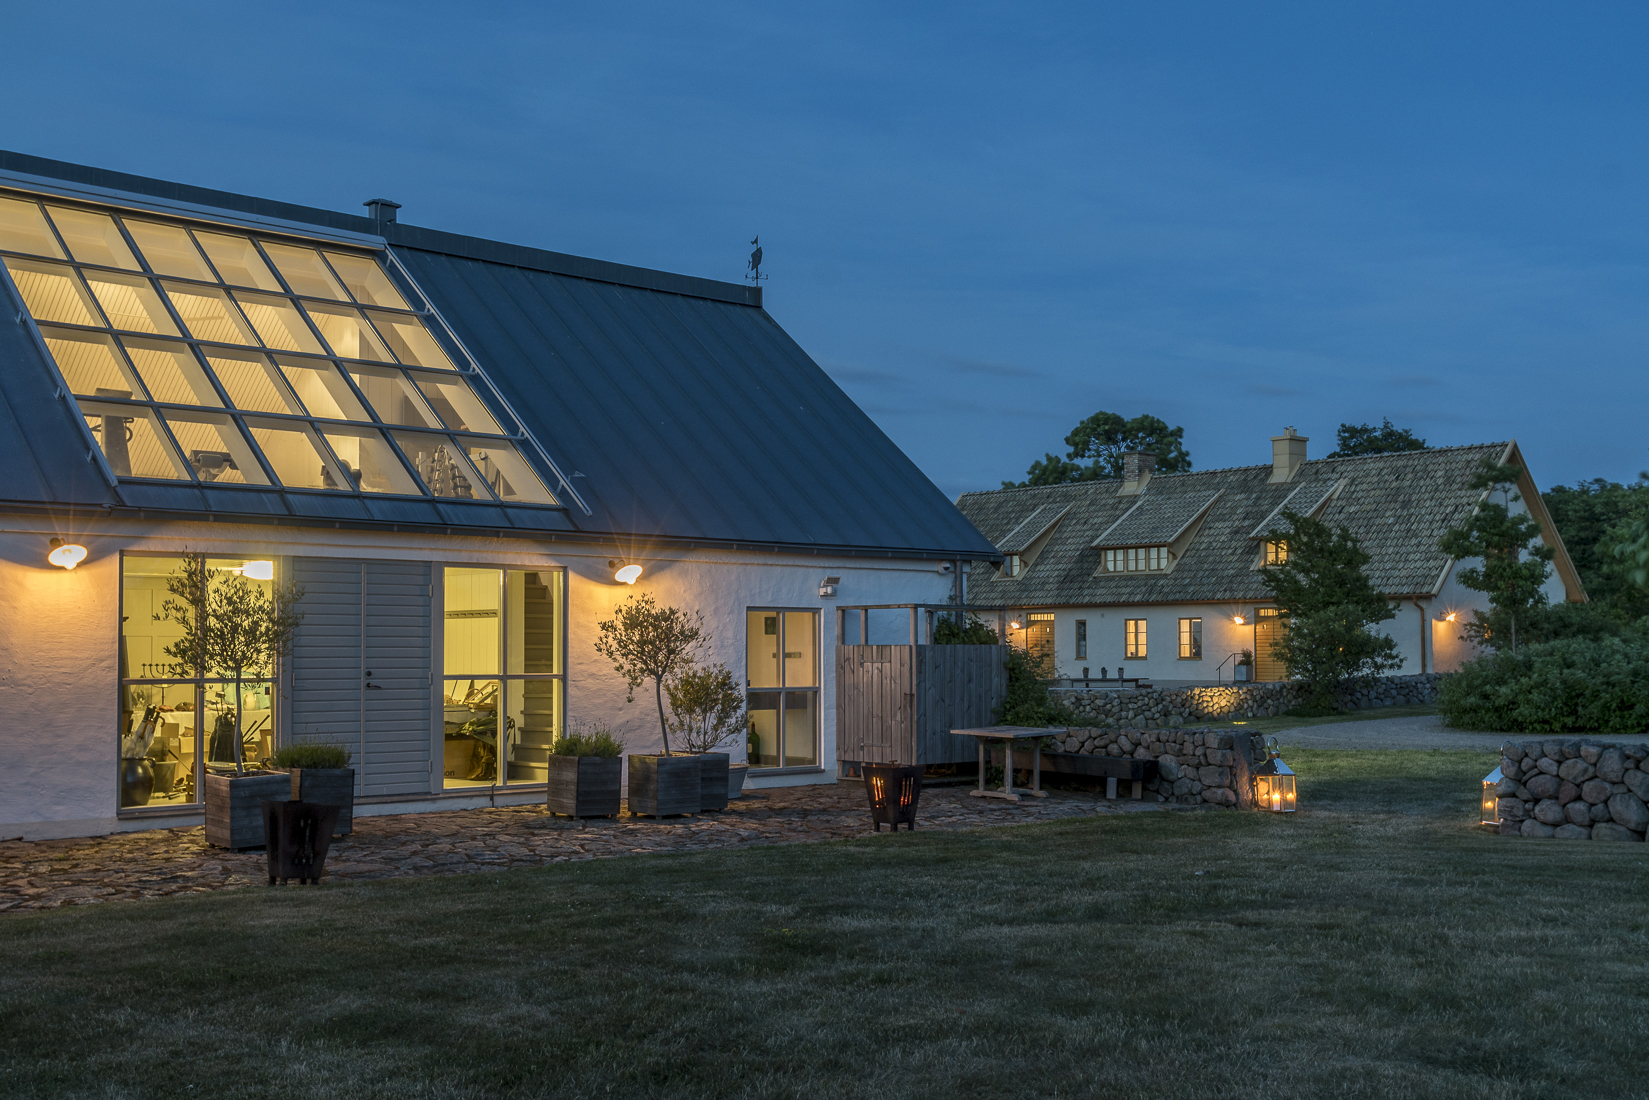 Fattoria / ranch / campagna per Vendita alle ore Olastorps Watermill Olastorpsägen 97 Bjärehalvön Torekov, Vastkusten, 26995 Svezia